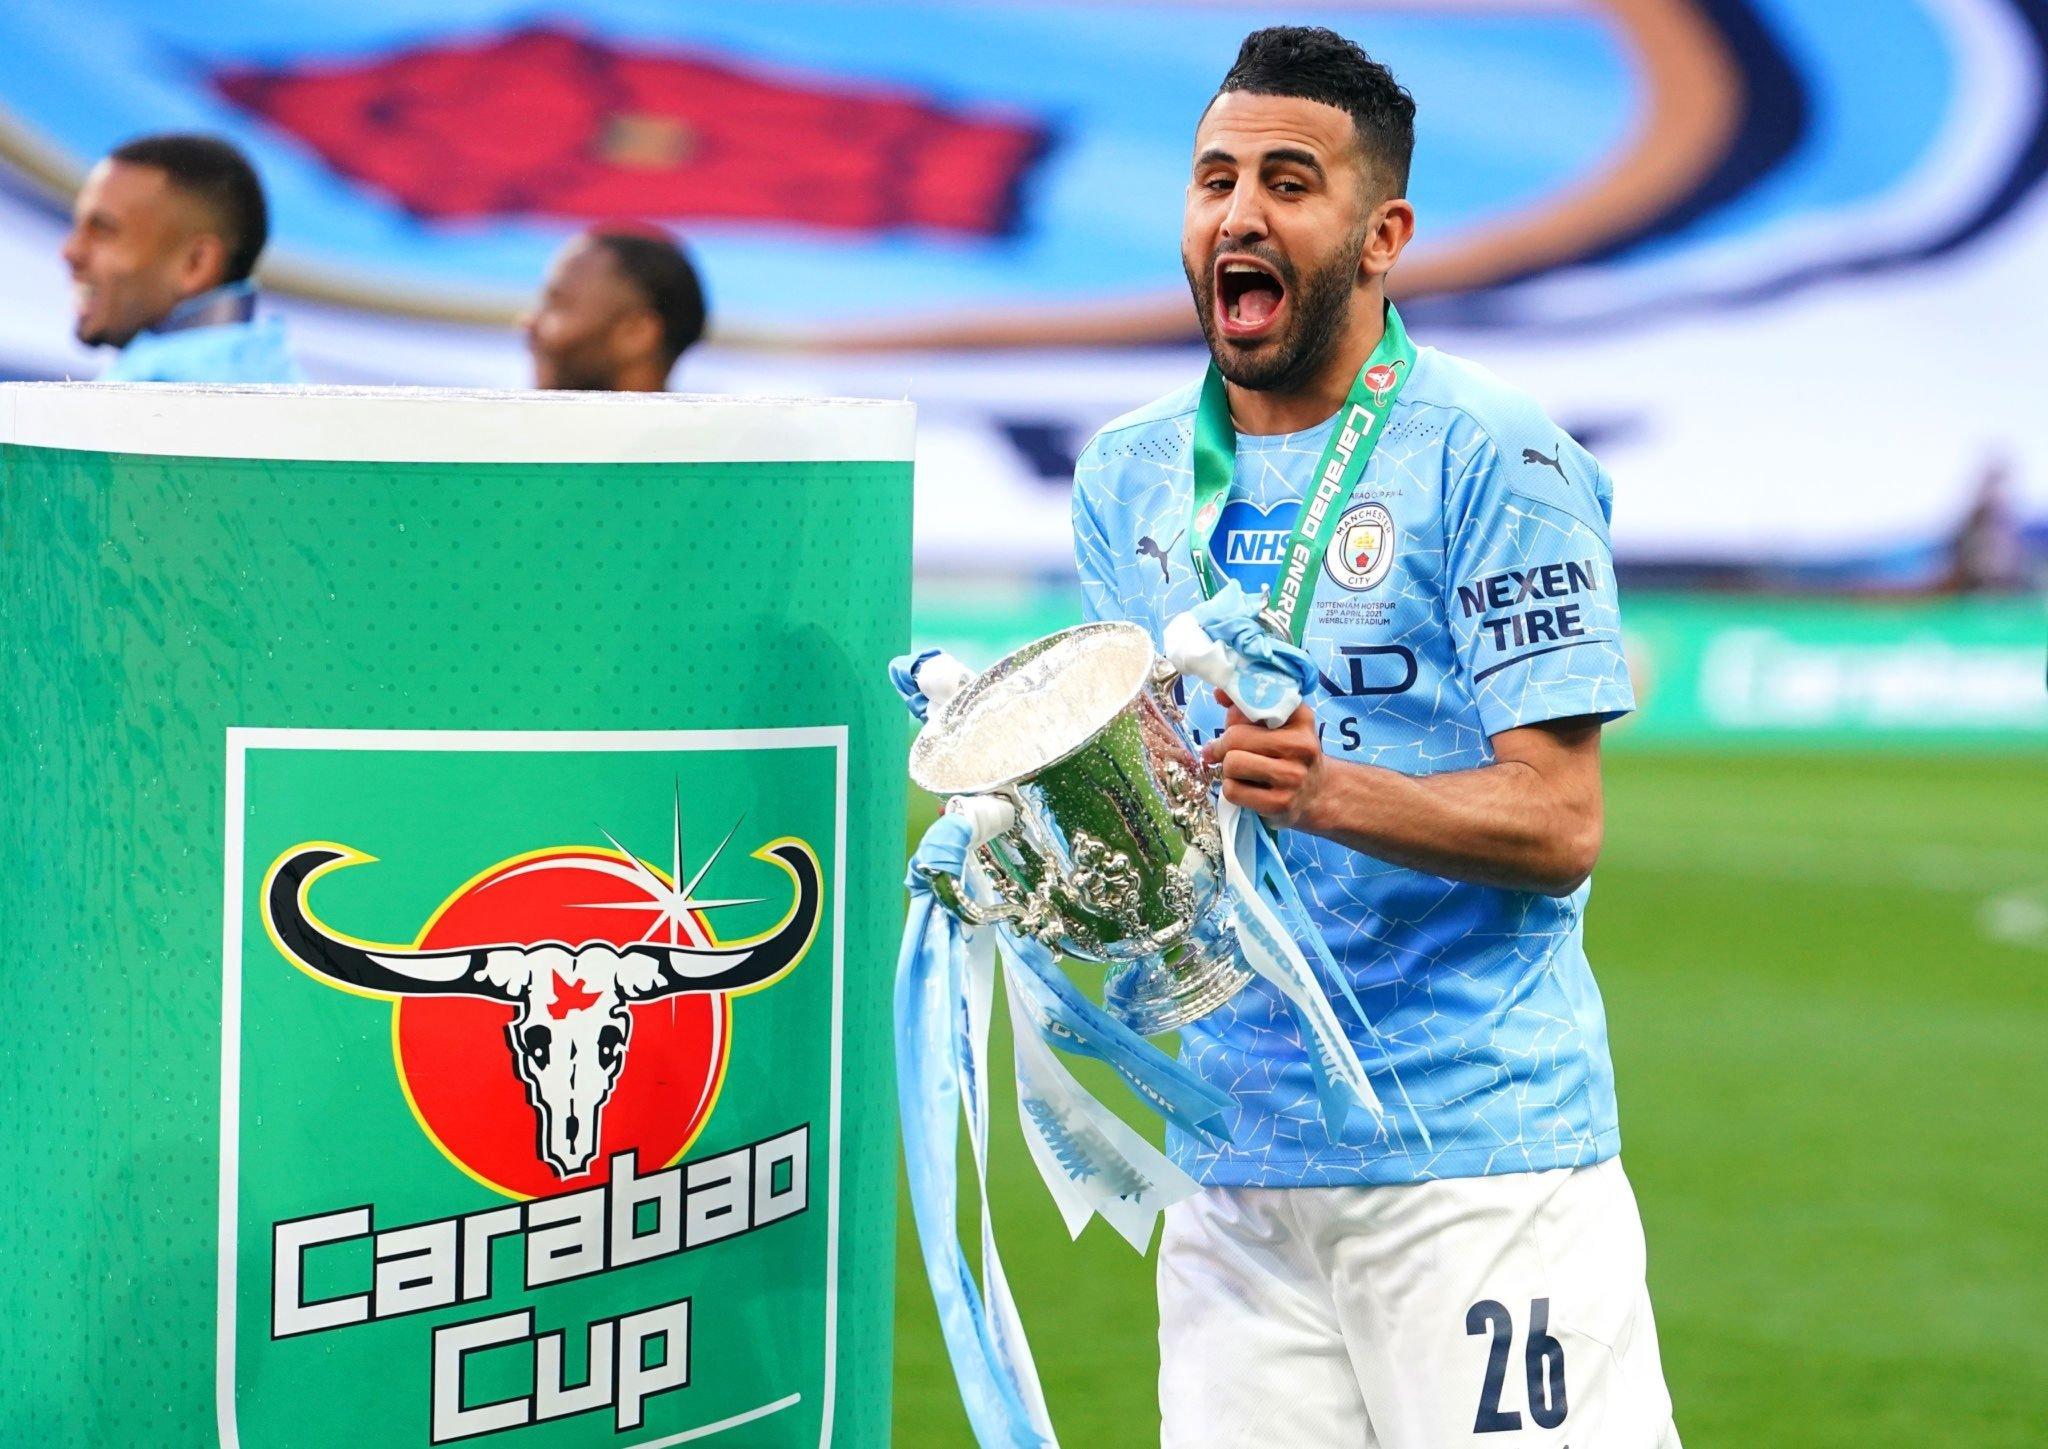 Mahrez joie EFL CUP